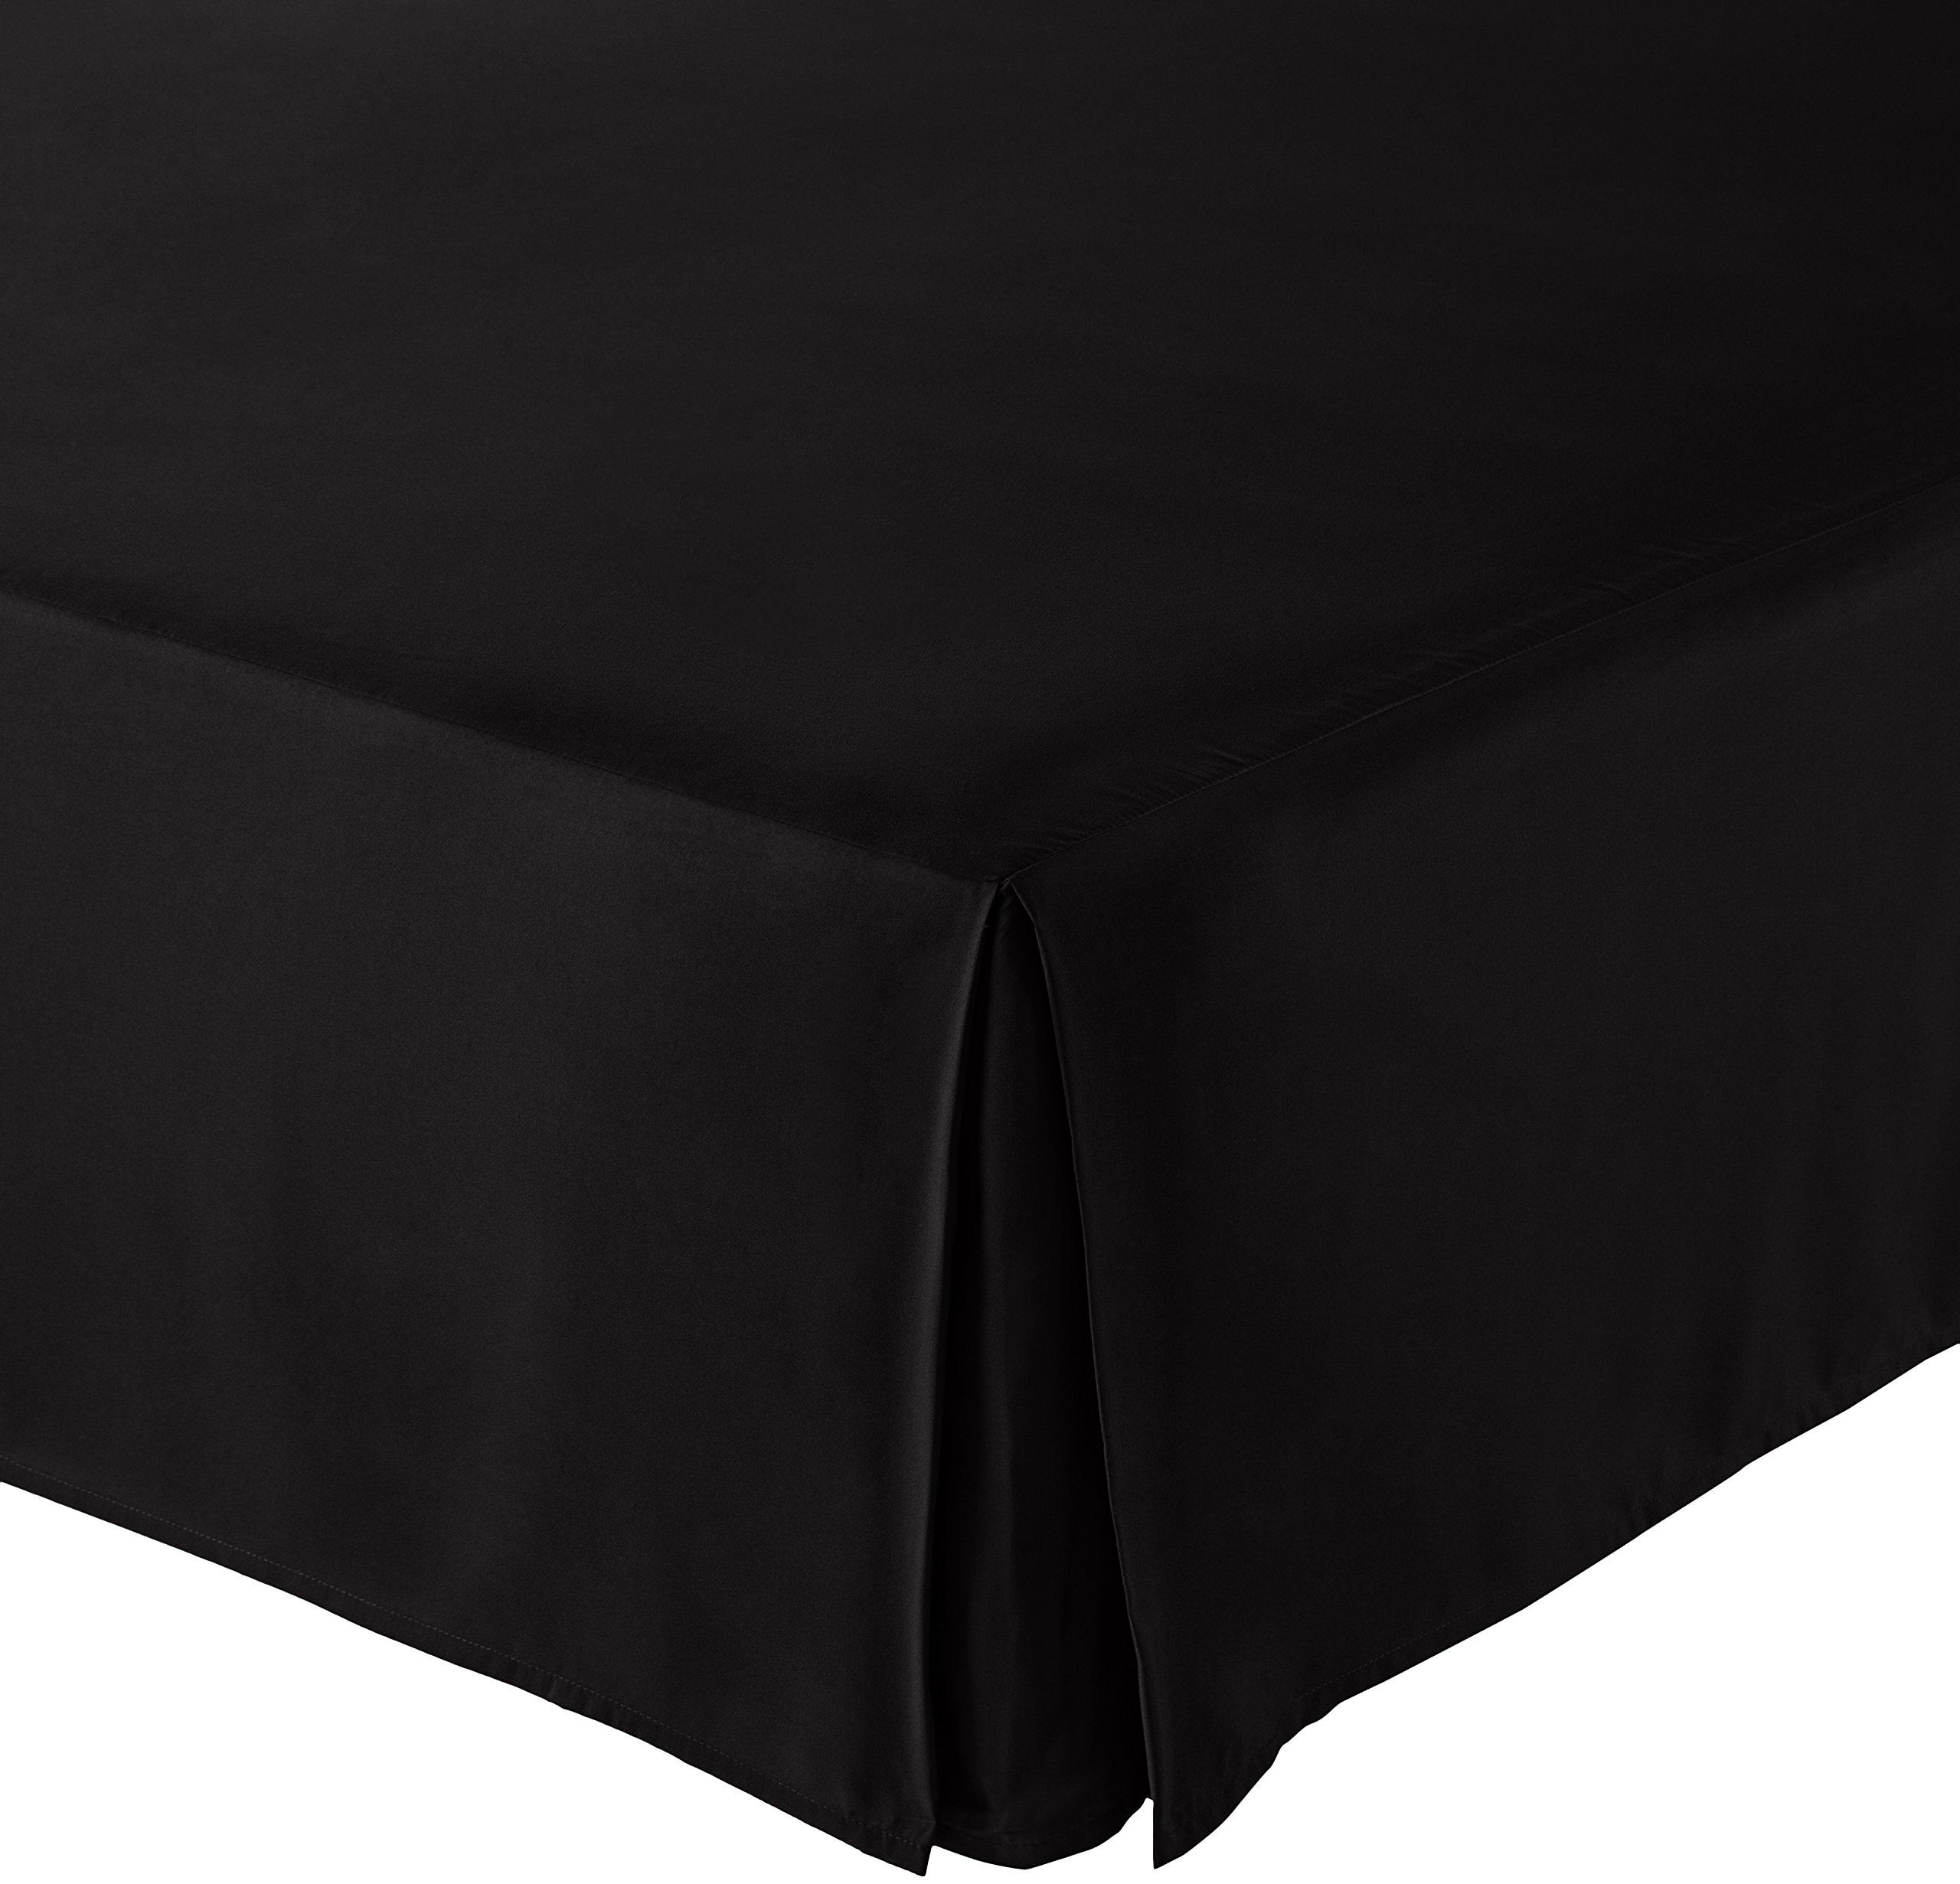 AmazonBasics Pleated Bed Skirt - Queen, Black by AmazonBasics